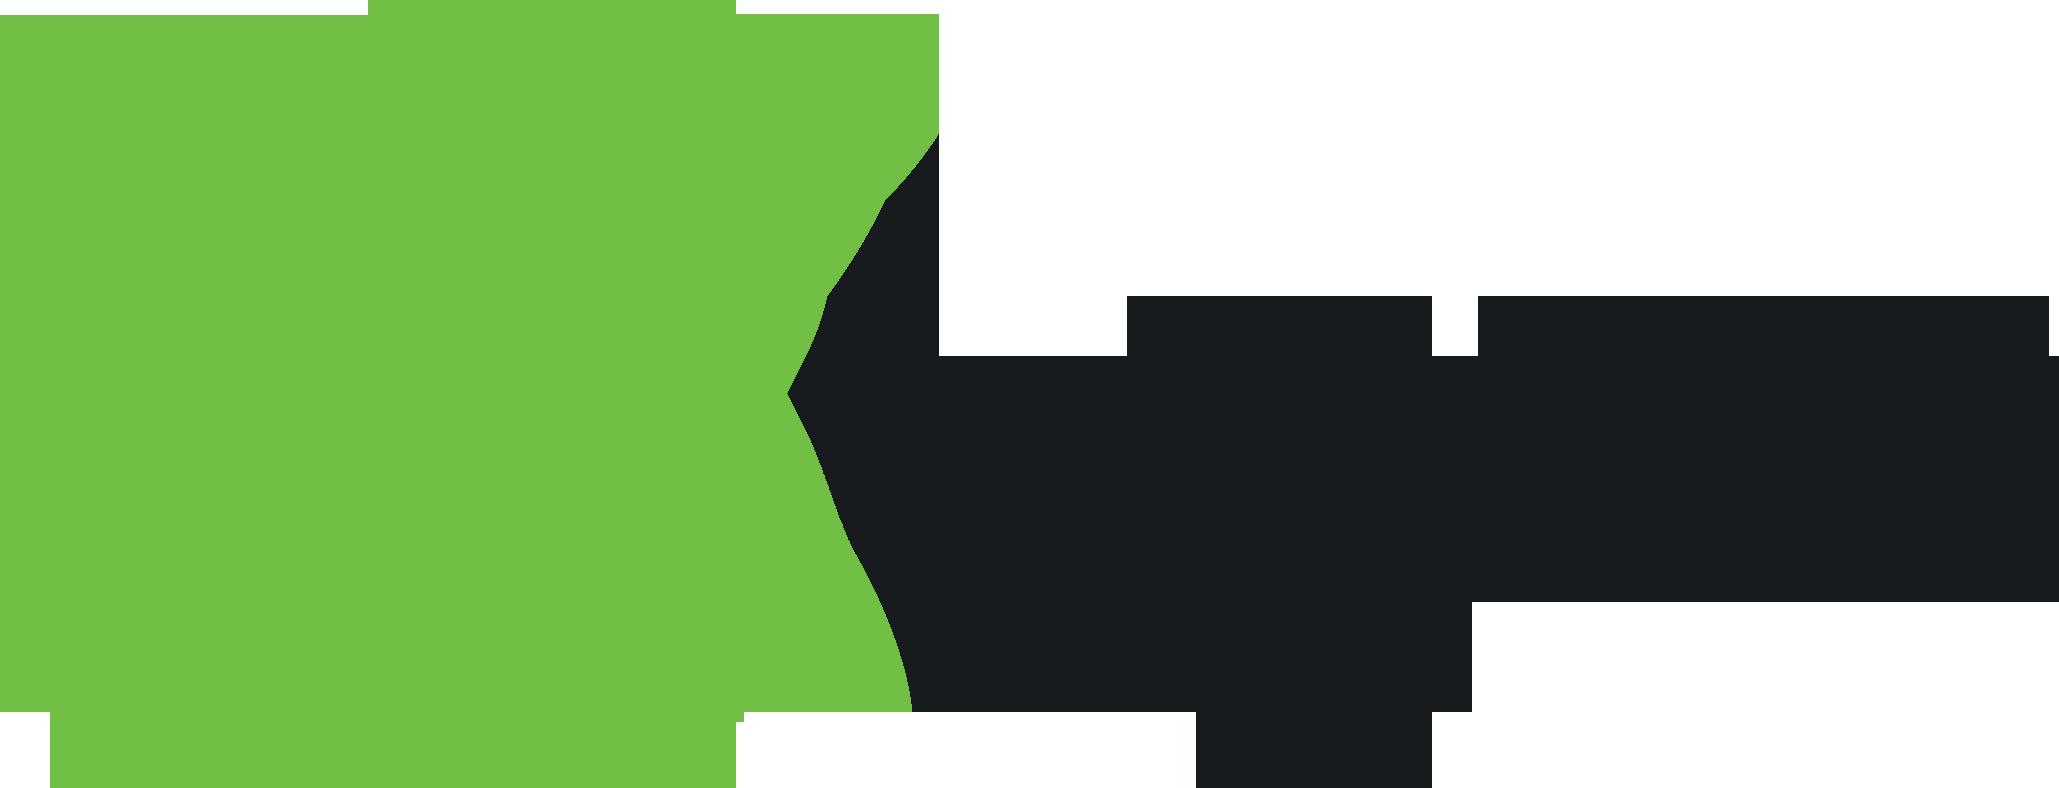 ileron_logo_ugcs_green_black_transparent.png